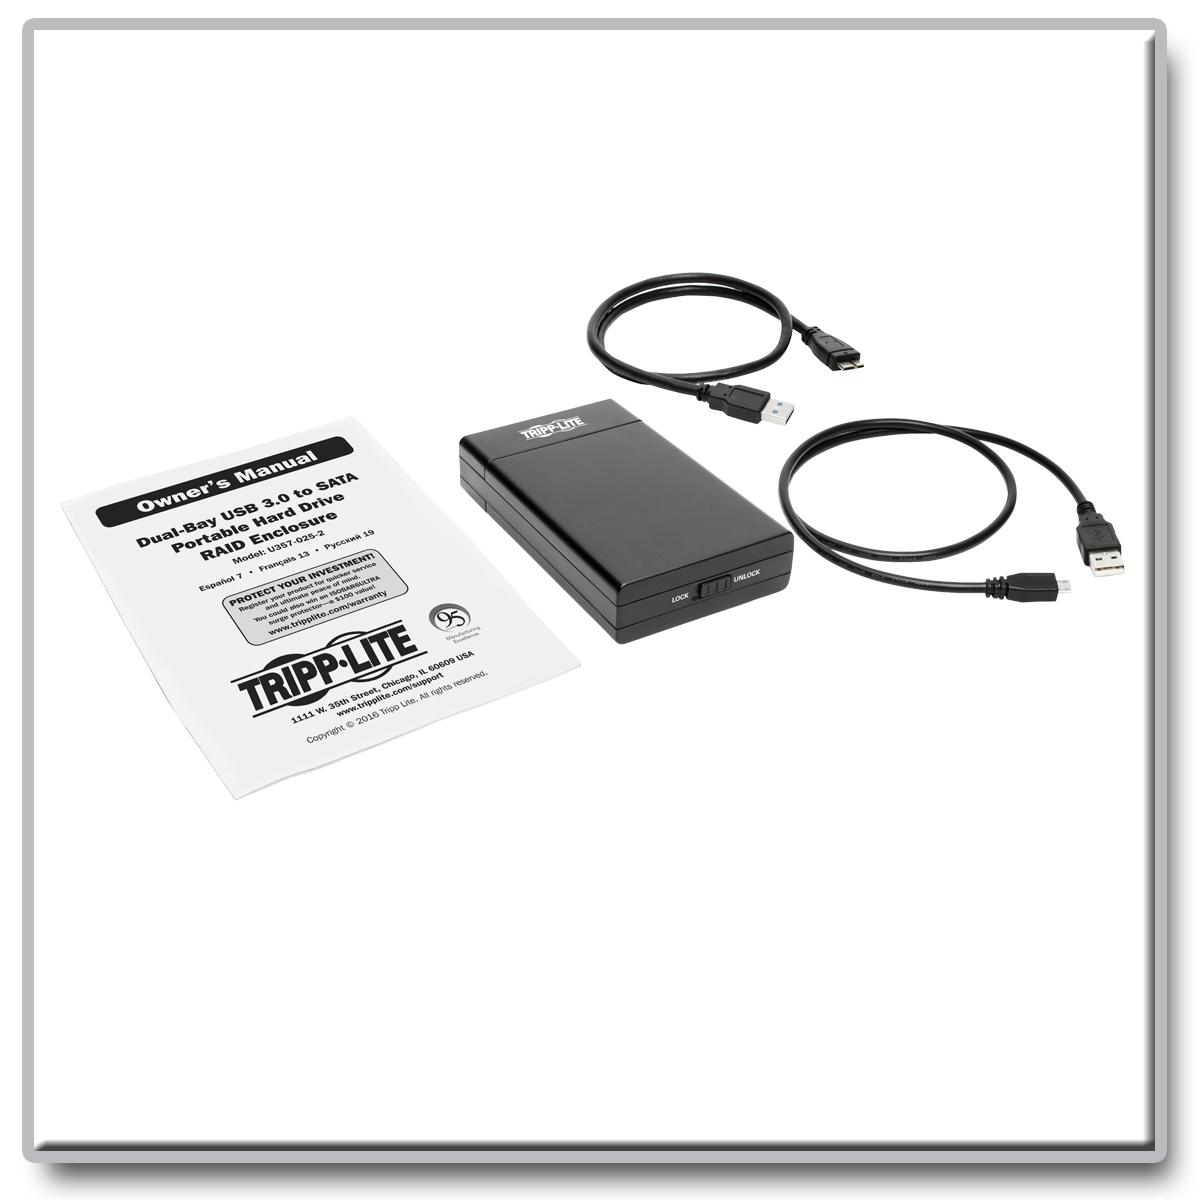 Tripp Lite Dual Bay Usb 30 Superspeed To 25 Sata 6gb S U357 025 2 Seagate Backup Plus Desktop Hub 8tb Hdd External 35 Inch 3 Year Warranty New Original Product Image